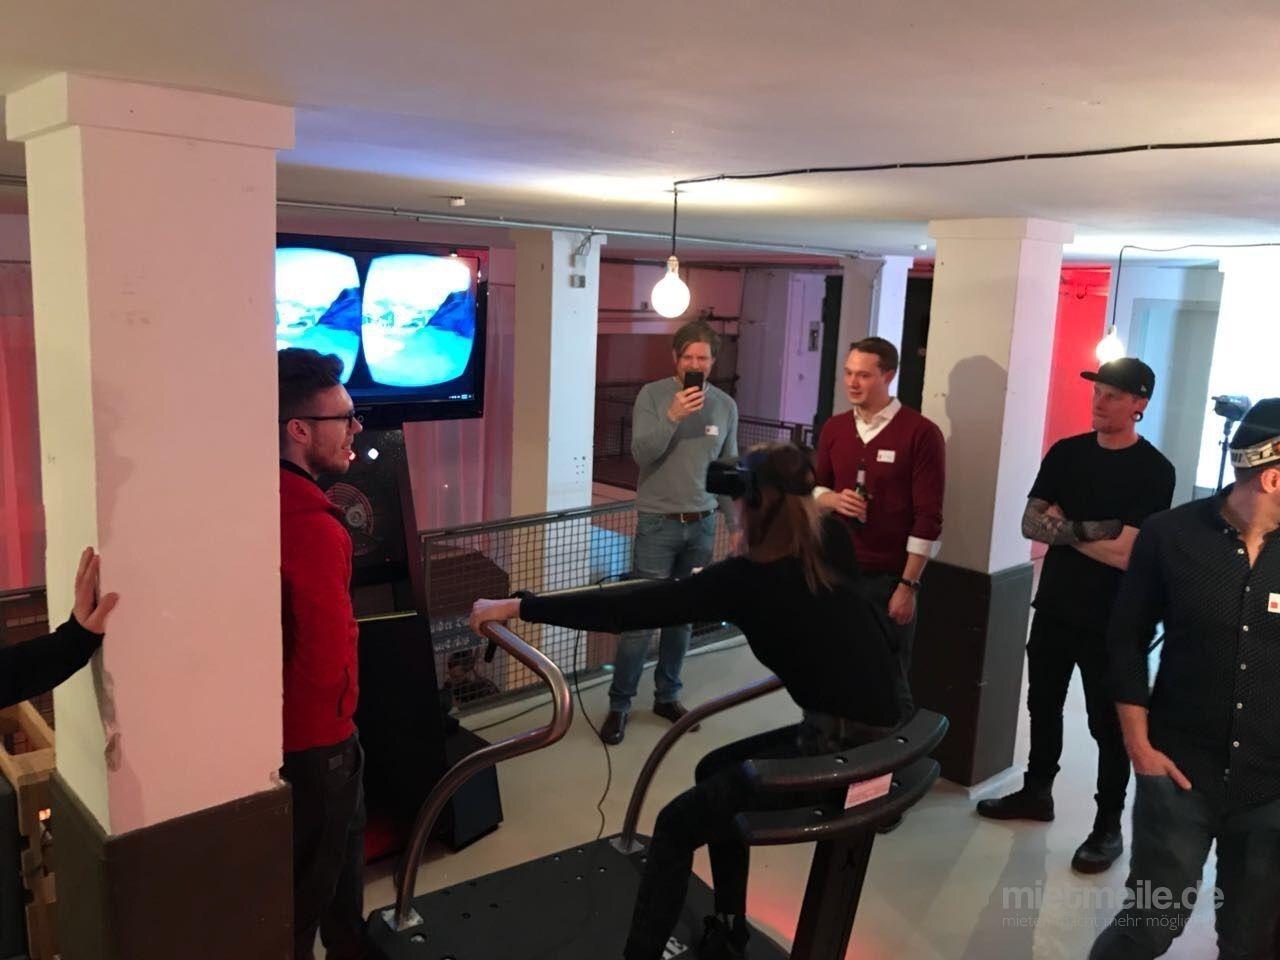 Simulatoren mieten & vermieten - Virtual Reality 5D Simulator 24 Abenteuer! Preis inkl. Techniker/Betreuer in Neukirchen-Vluyn